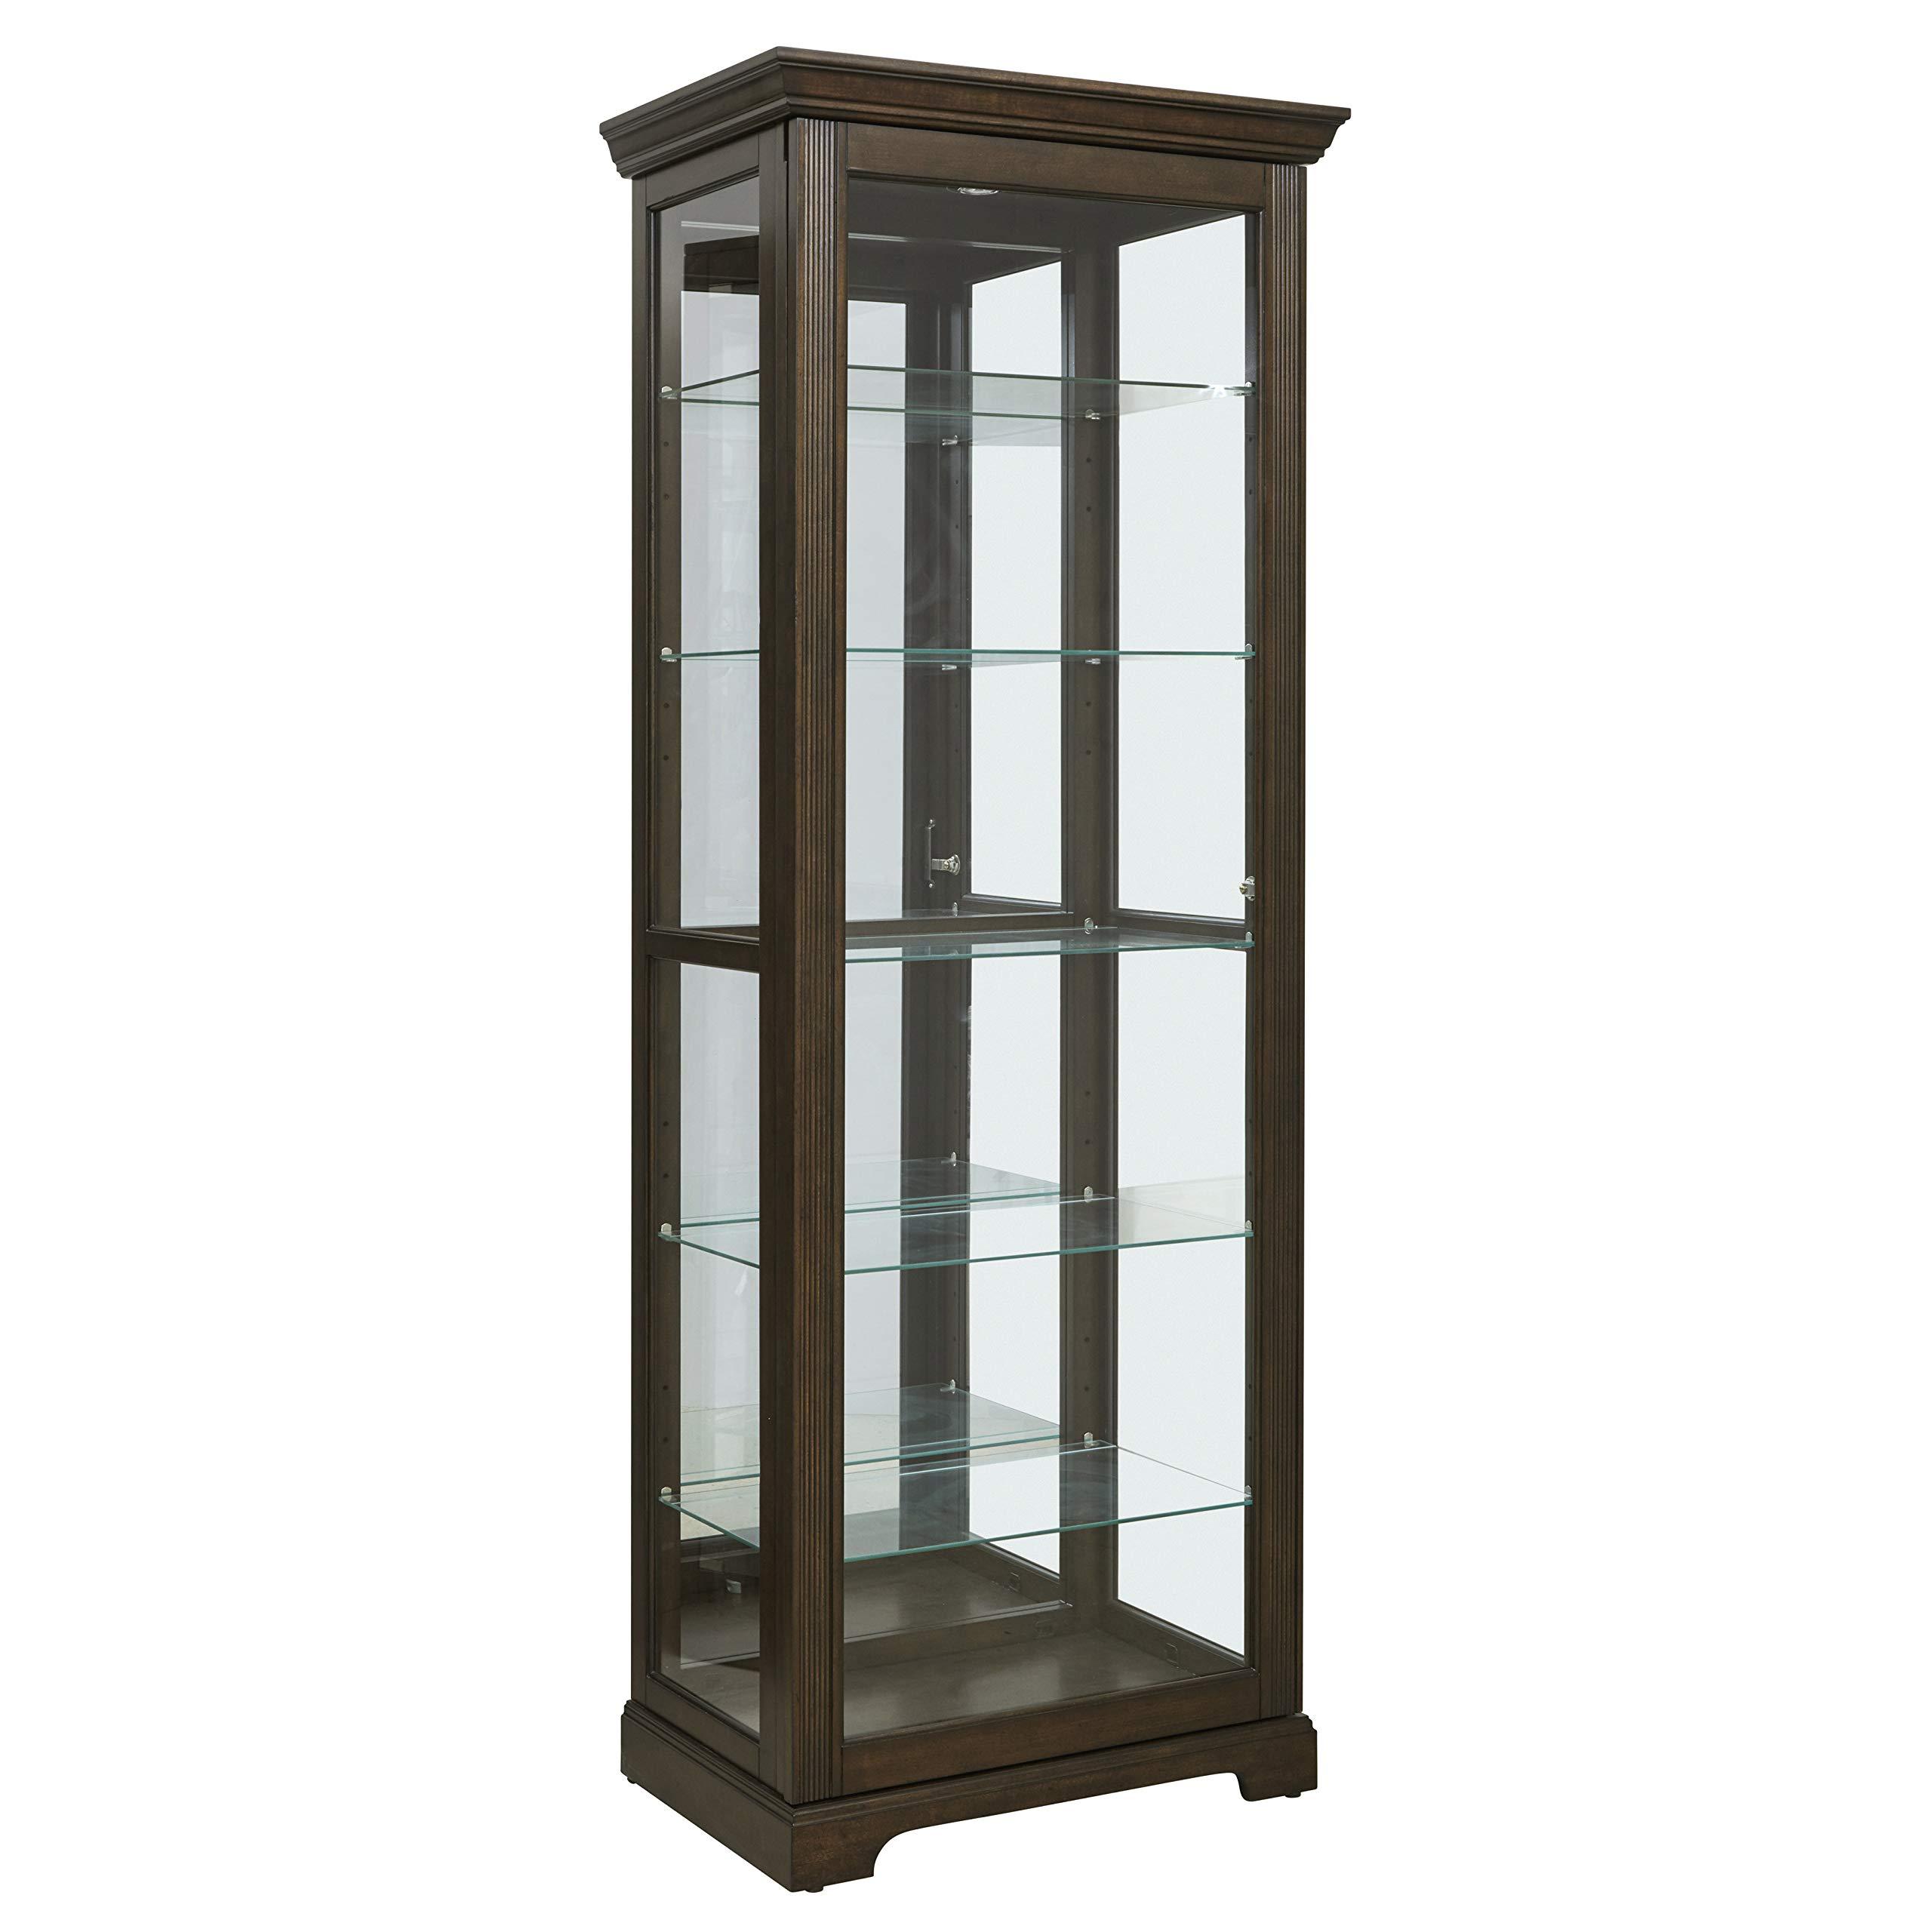 Pulaski  Locking Sliding Door Curio Display Cabinet, 29.25'' L x 19.5'' W x 80.0'' H, Cherry